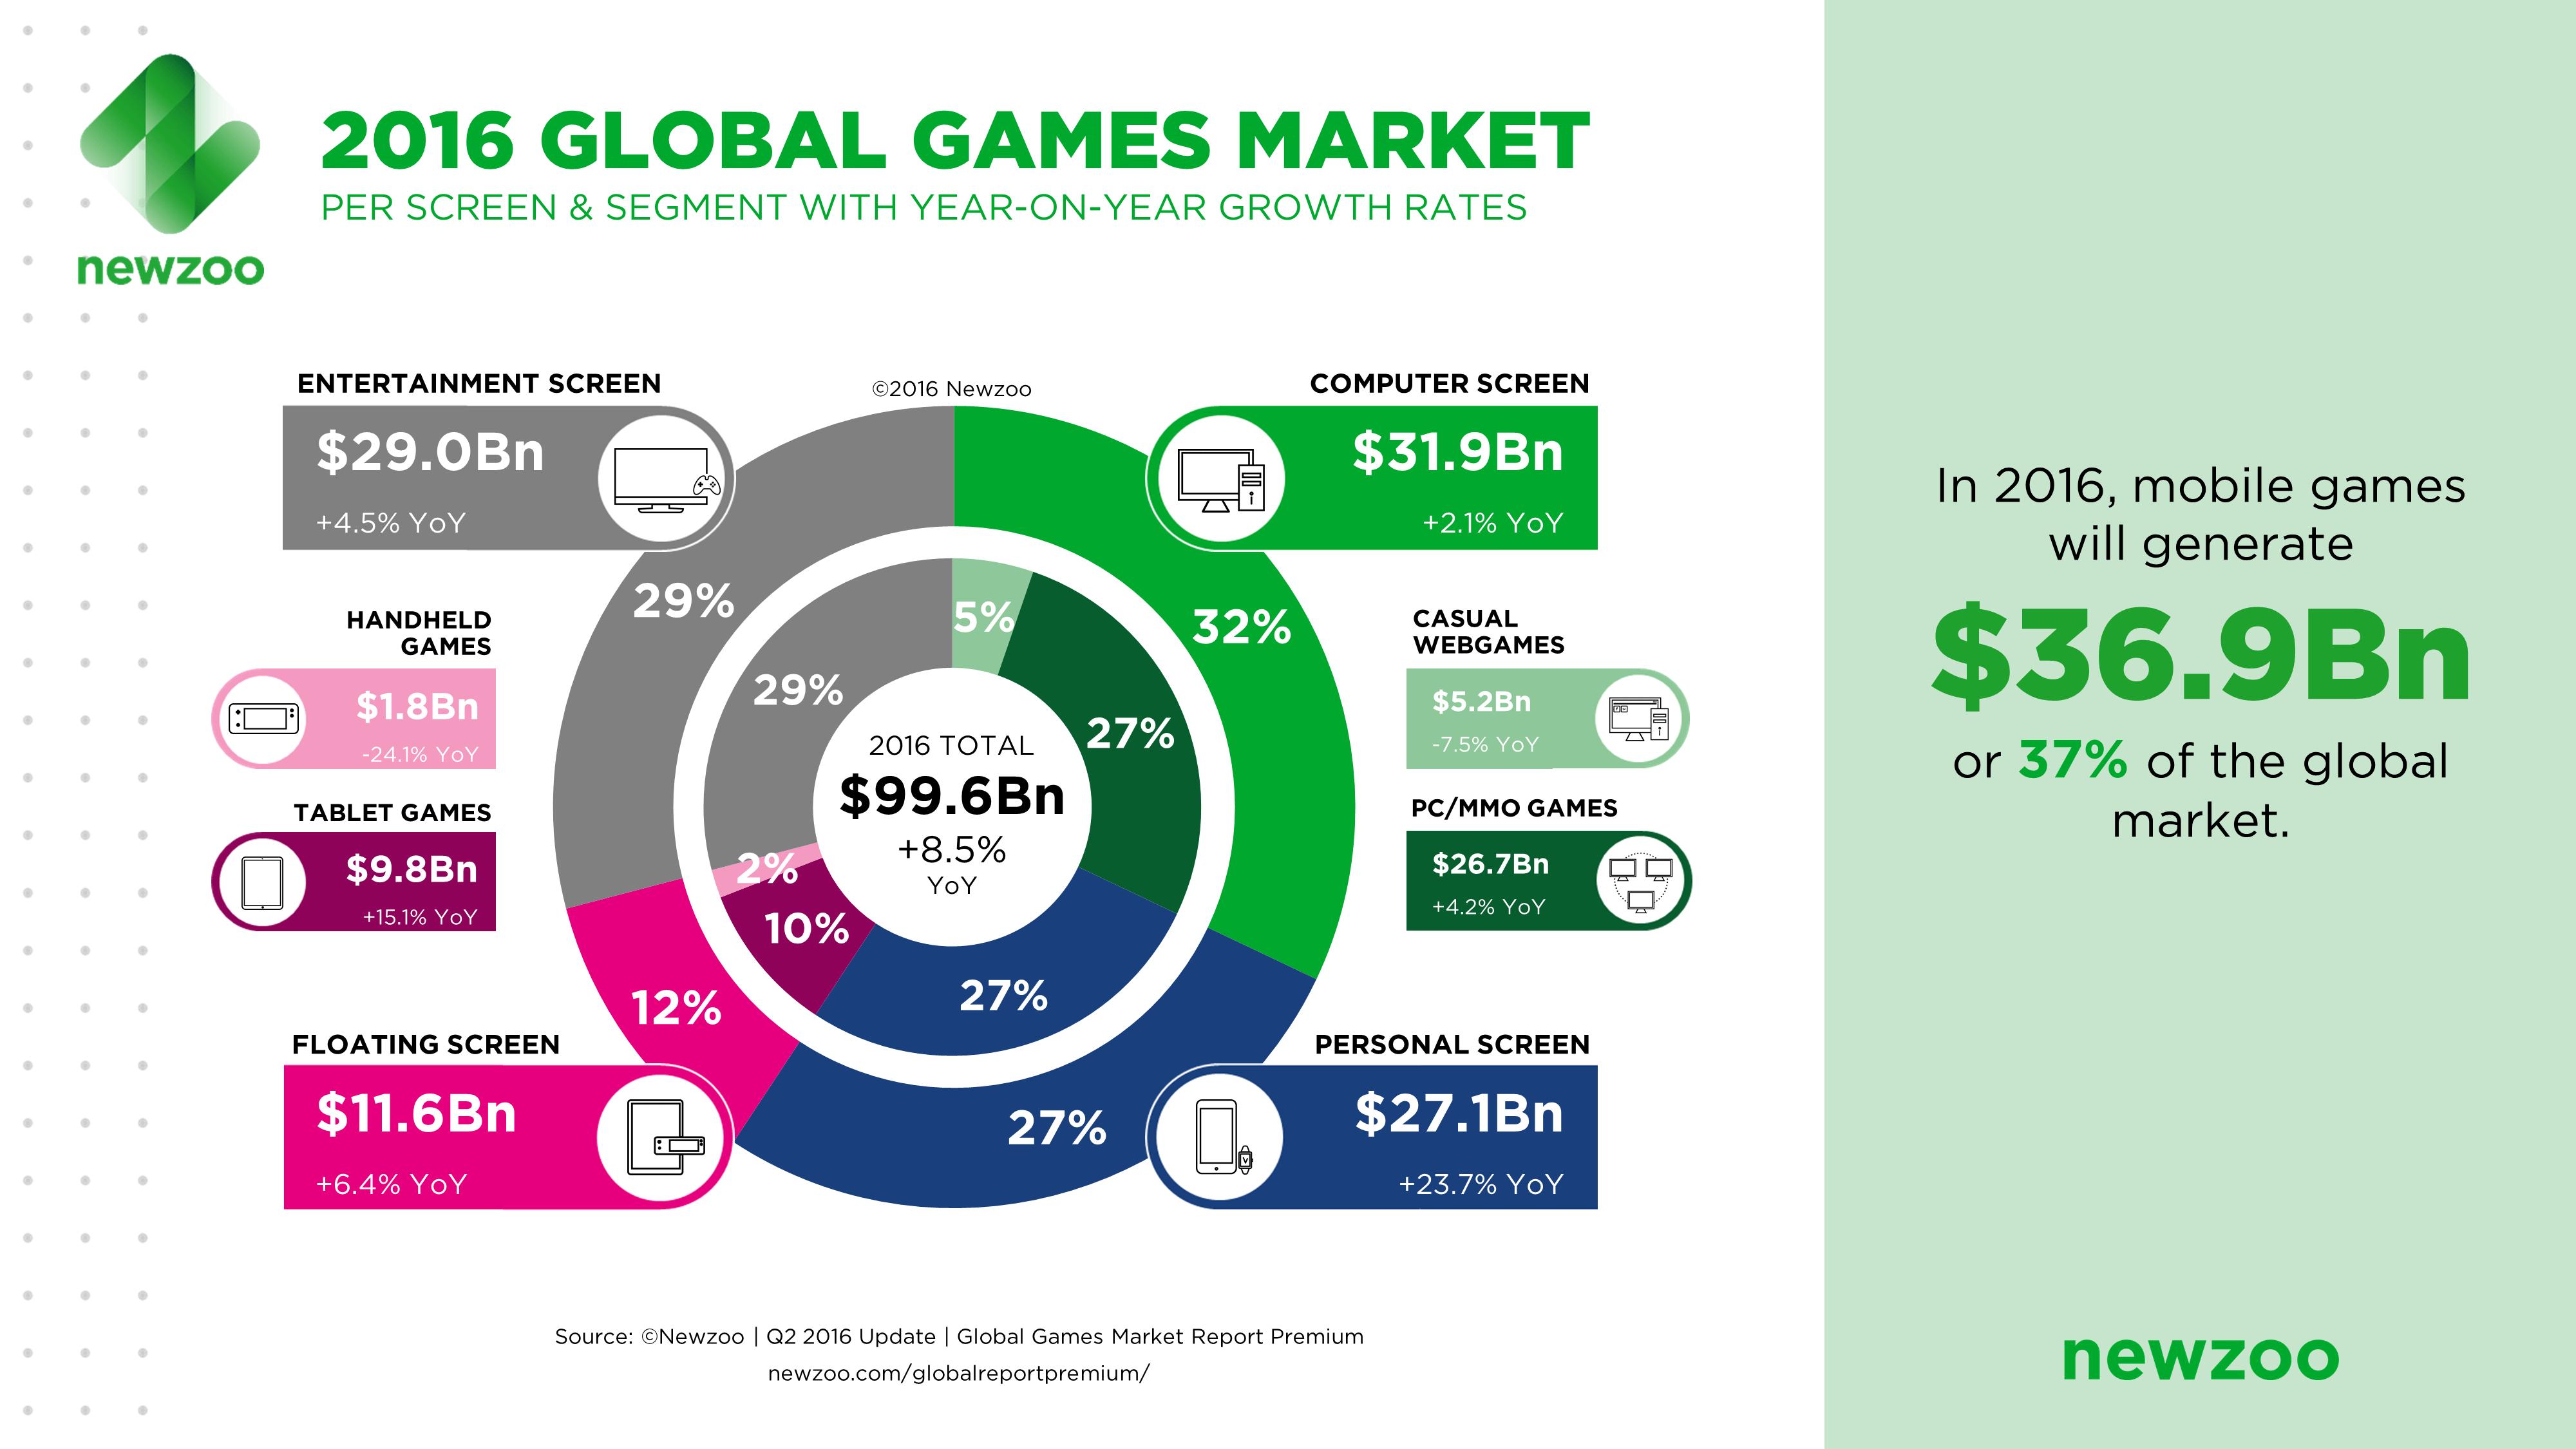 Infographic_2016GlobalGamesMarket_Rocz3DStudio